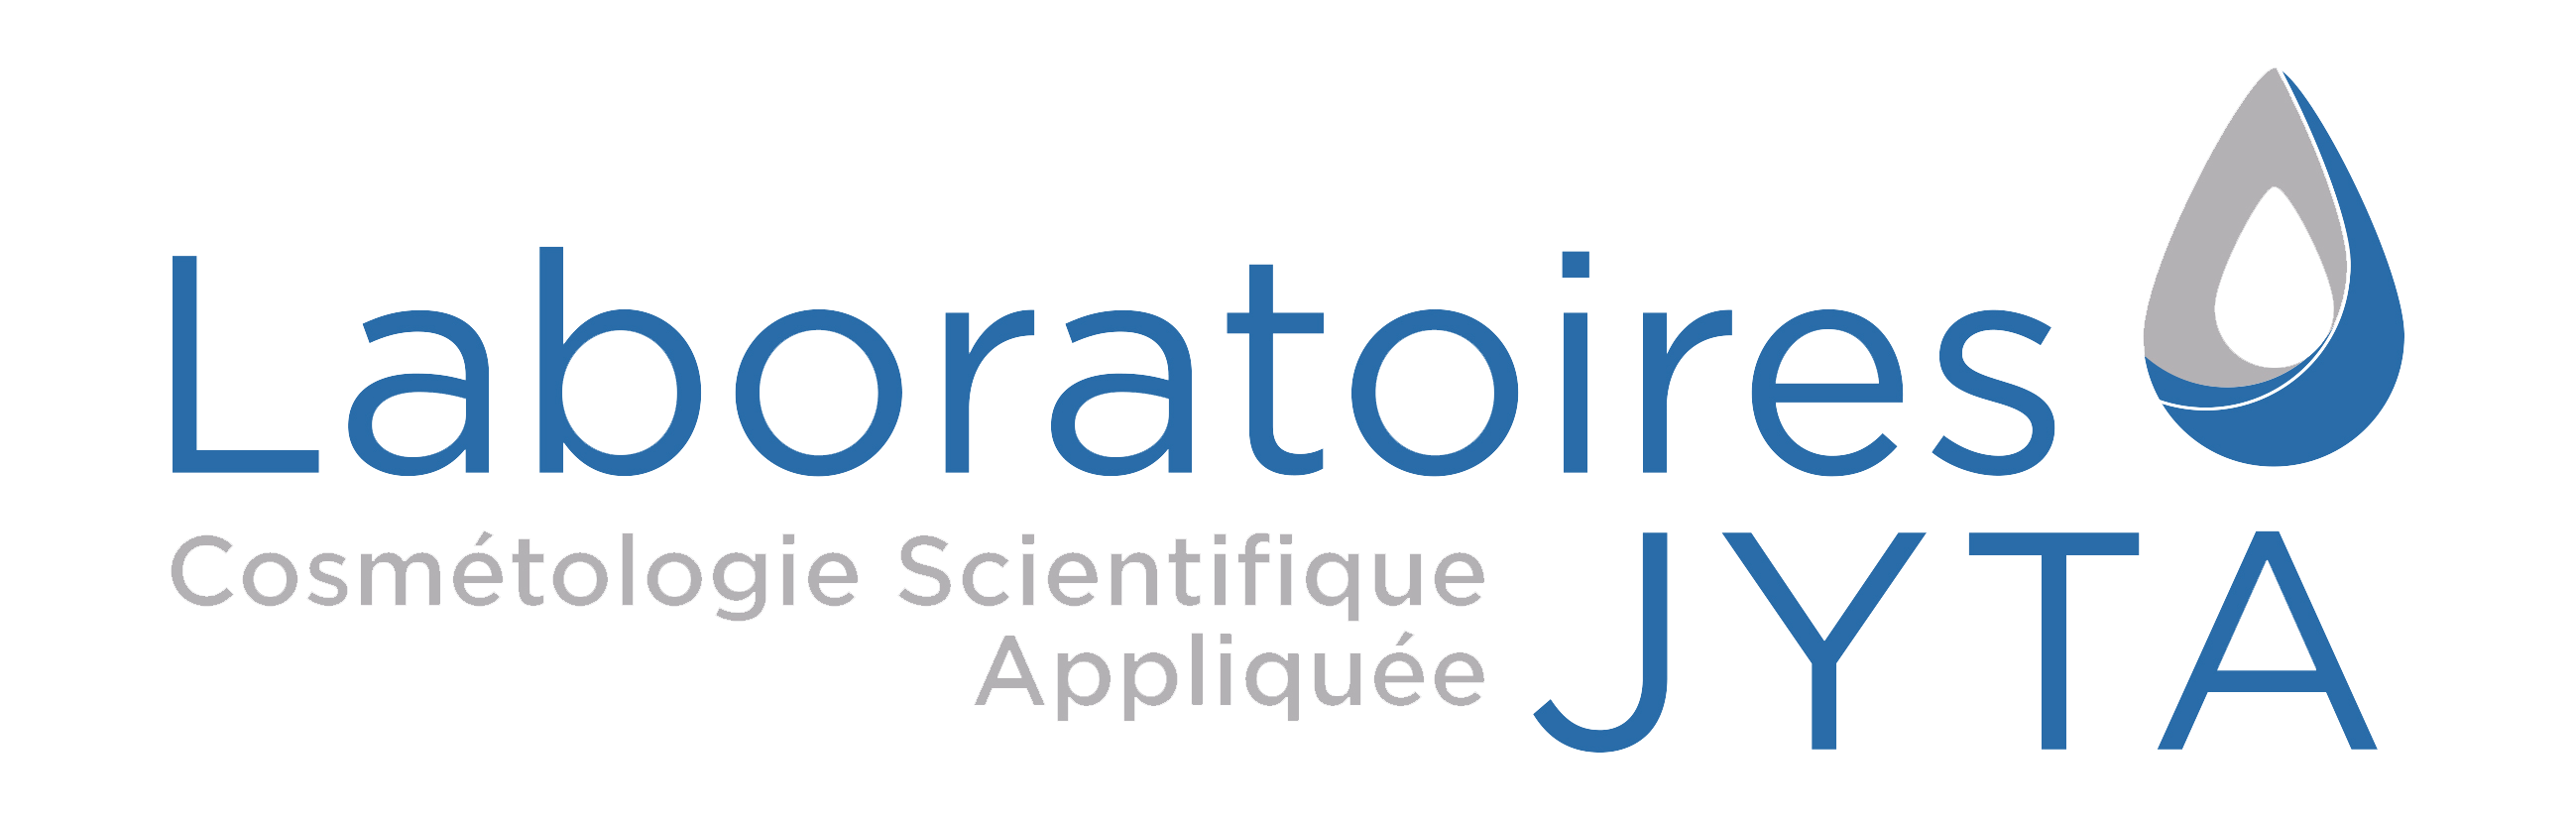 Laboratoires JYTA